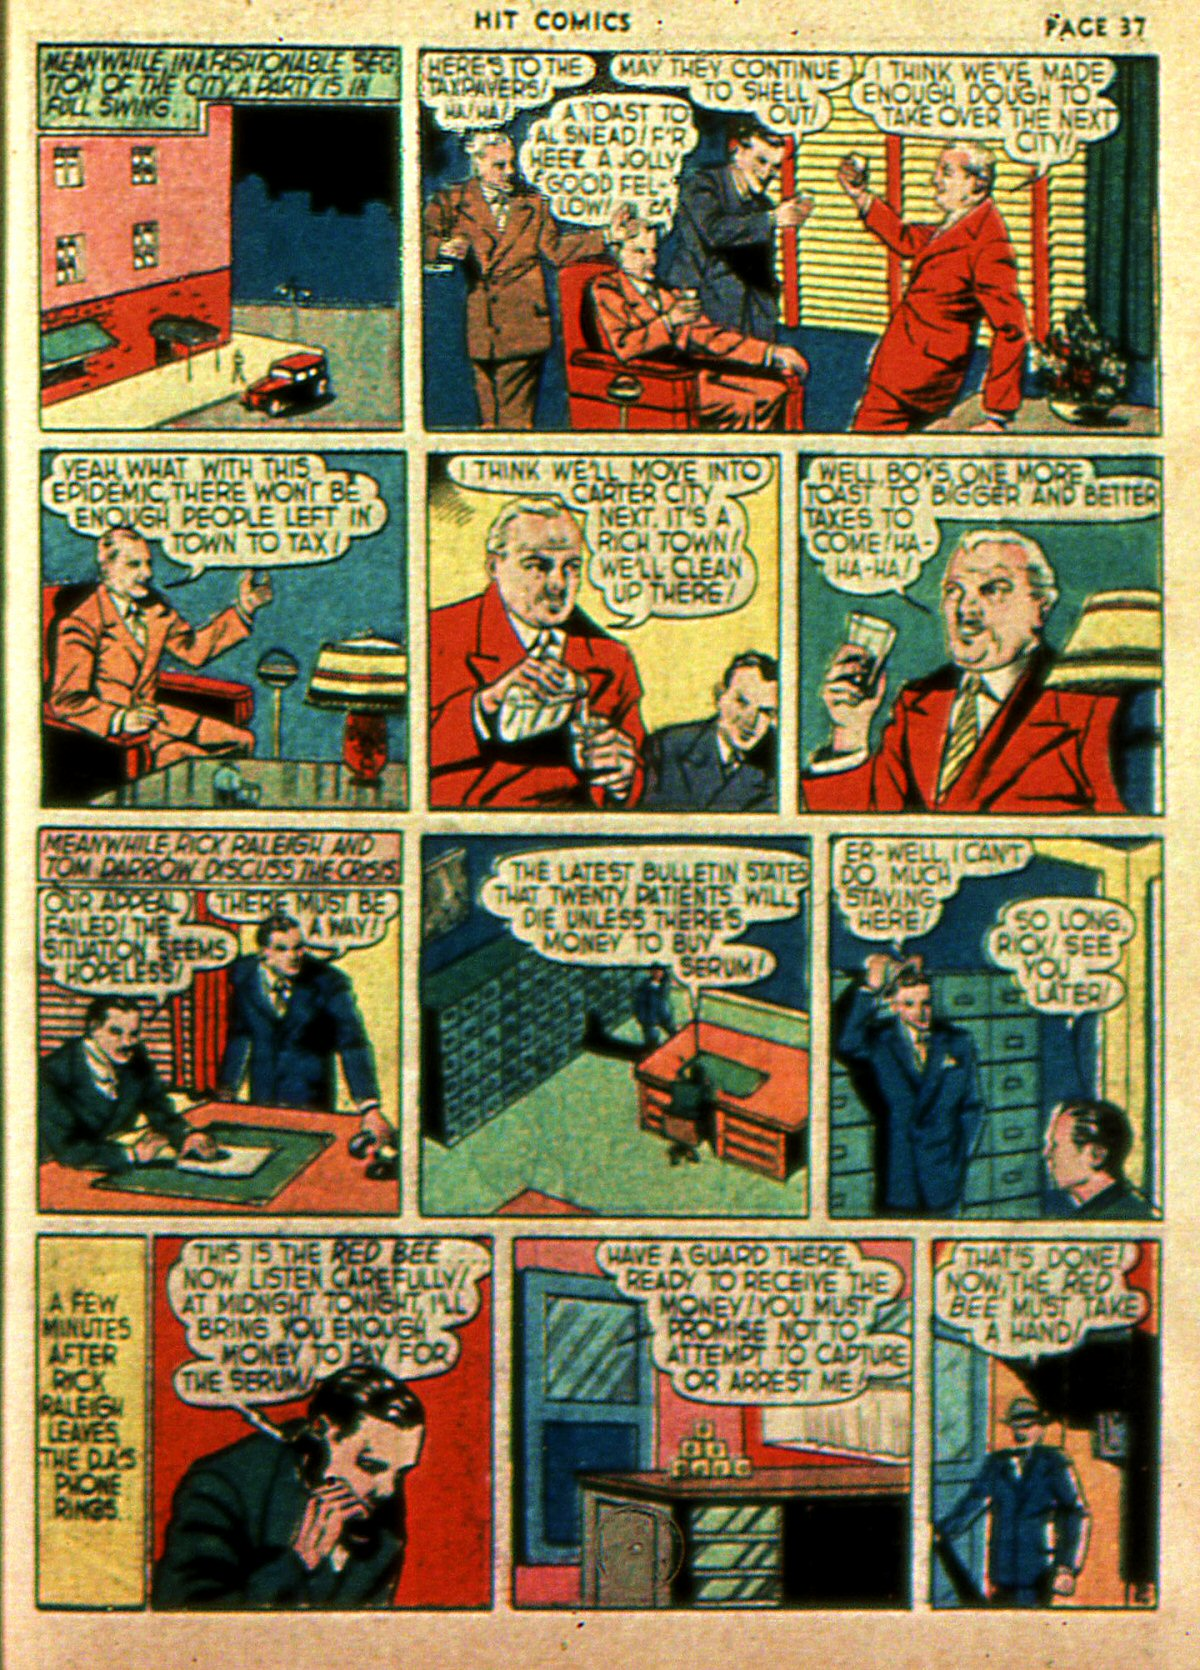 Read online Hit Comics comic -  Issue #2 - 39